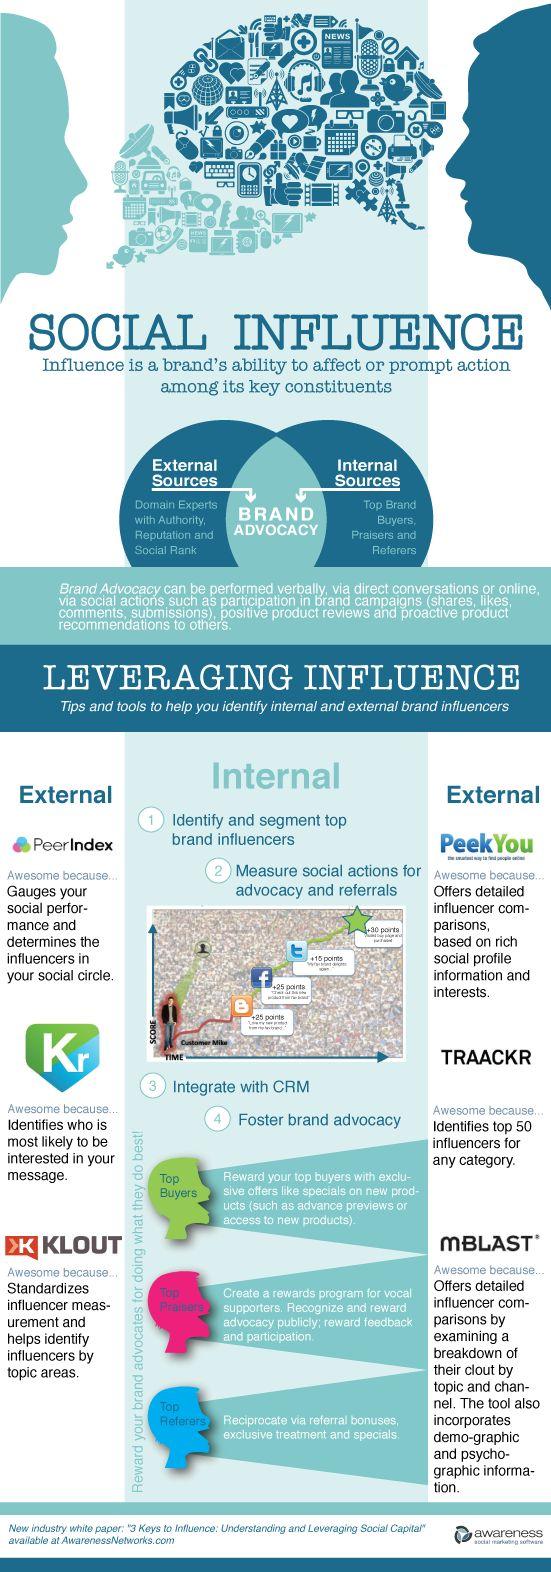 #socialmedia  Influence Infographic, , pinned by Ensuite media: Infographic Socialmedia, Socialinfluenc, Website, Social Media, Leverage International, Influenc Infographic, Media Infographic, Extern Social, Social Influenc